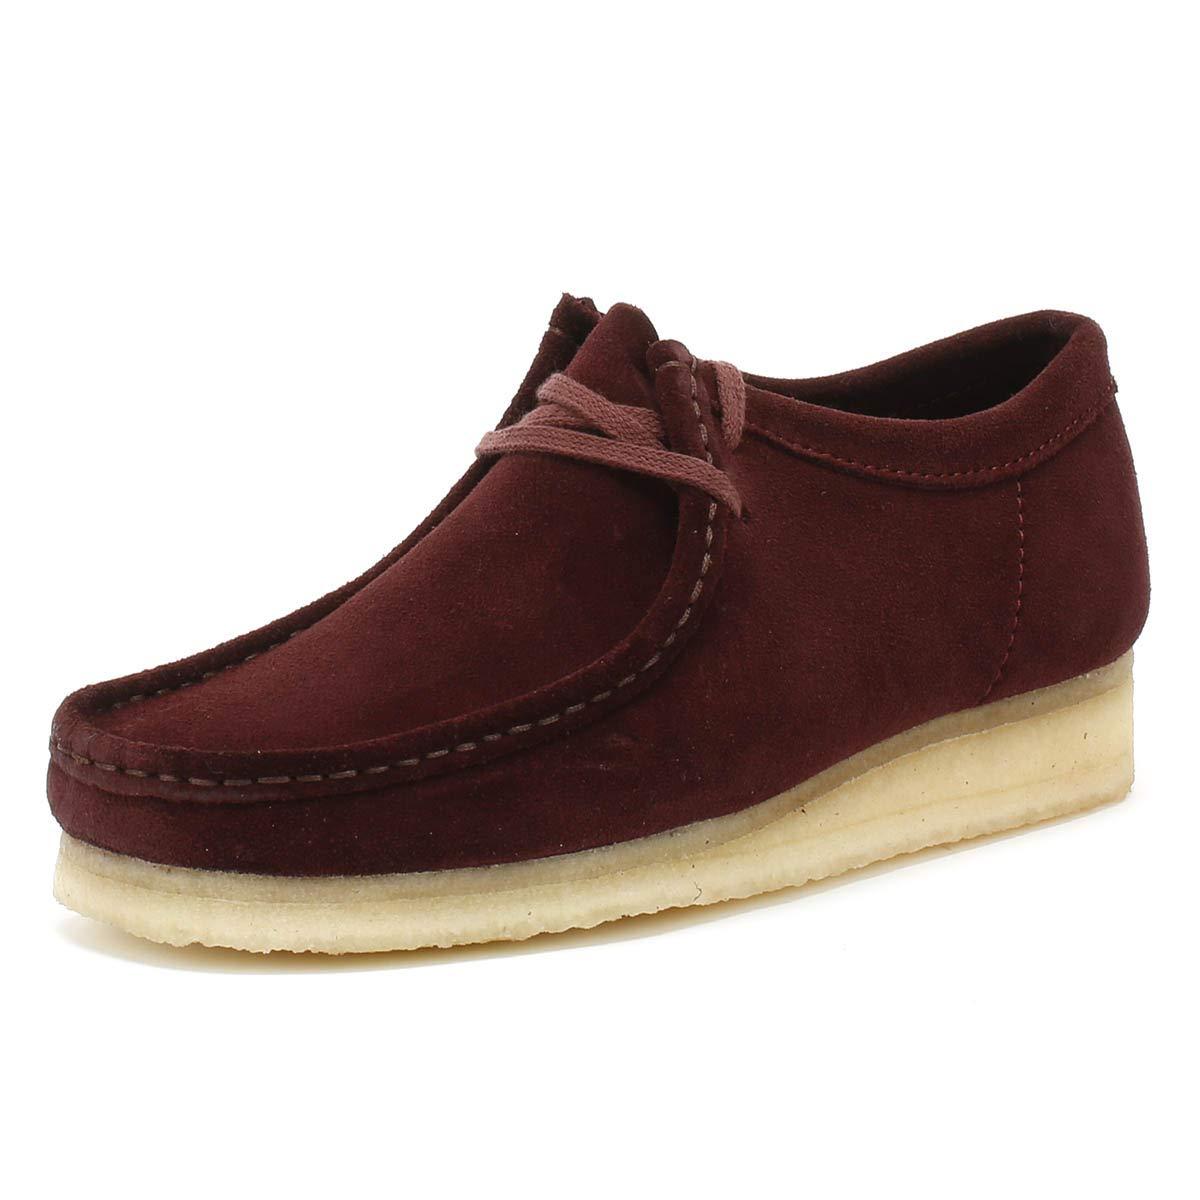 Clarks - Originals Wallabee Schuhe Bordeaux - Clarks 0ec631